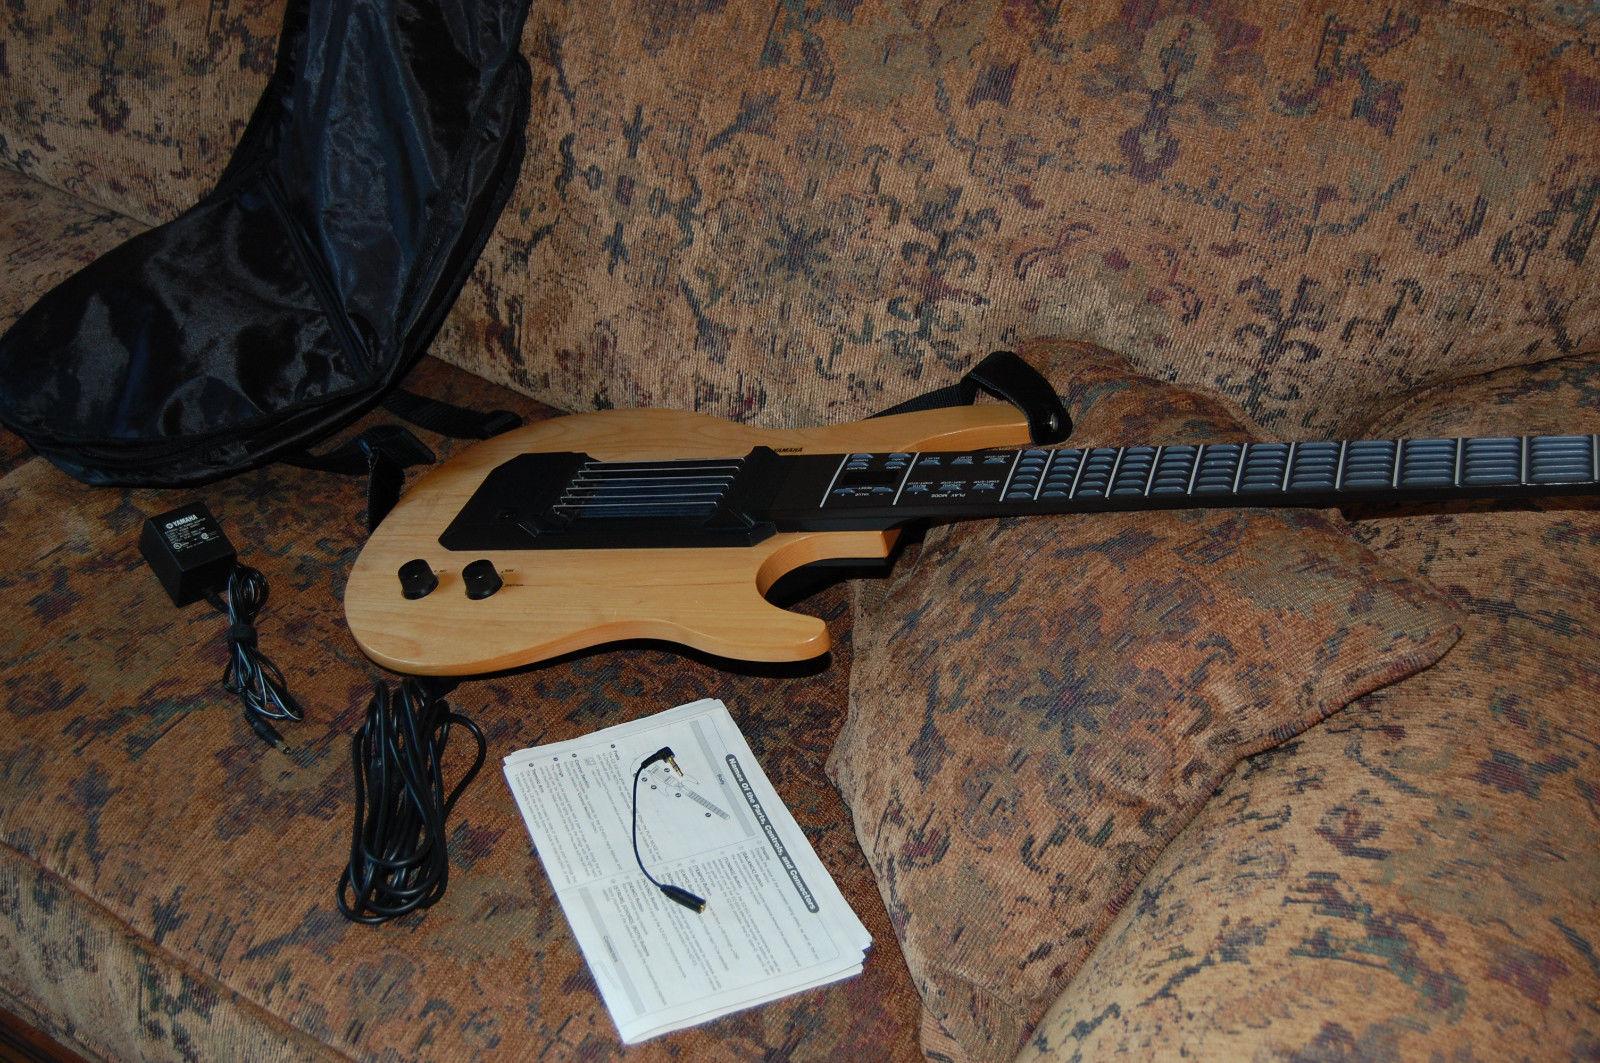 matrixsynth yamaha ez eg ezeg digital midi guitar synthesizer. Black Bedroom Furniture Sets. Home Design Ideas